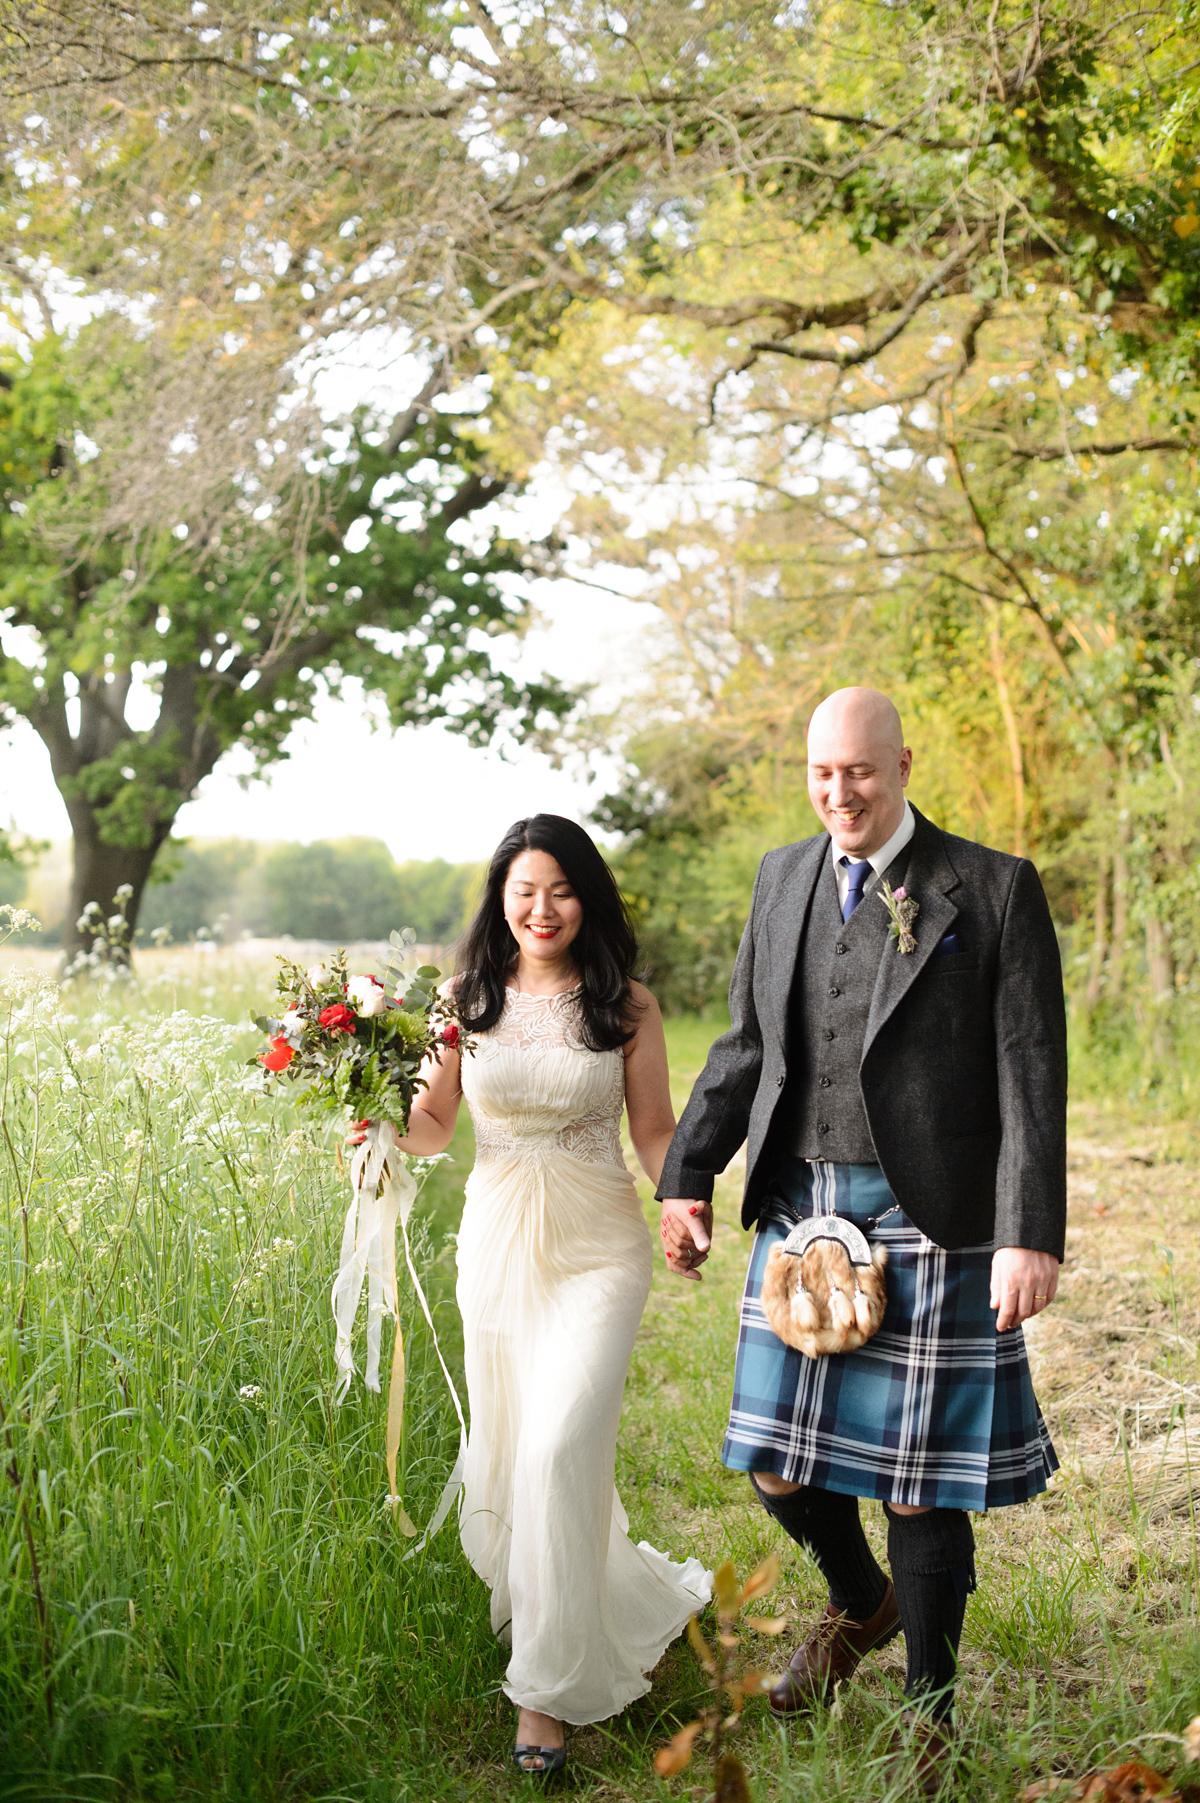 890e788b447d Tadashi Shoji french wedding - A Tadashi Shoji Gown for a Charming Wedding  in the French